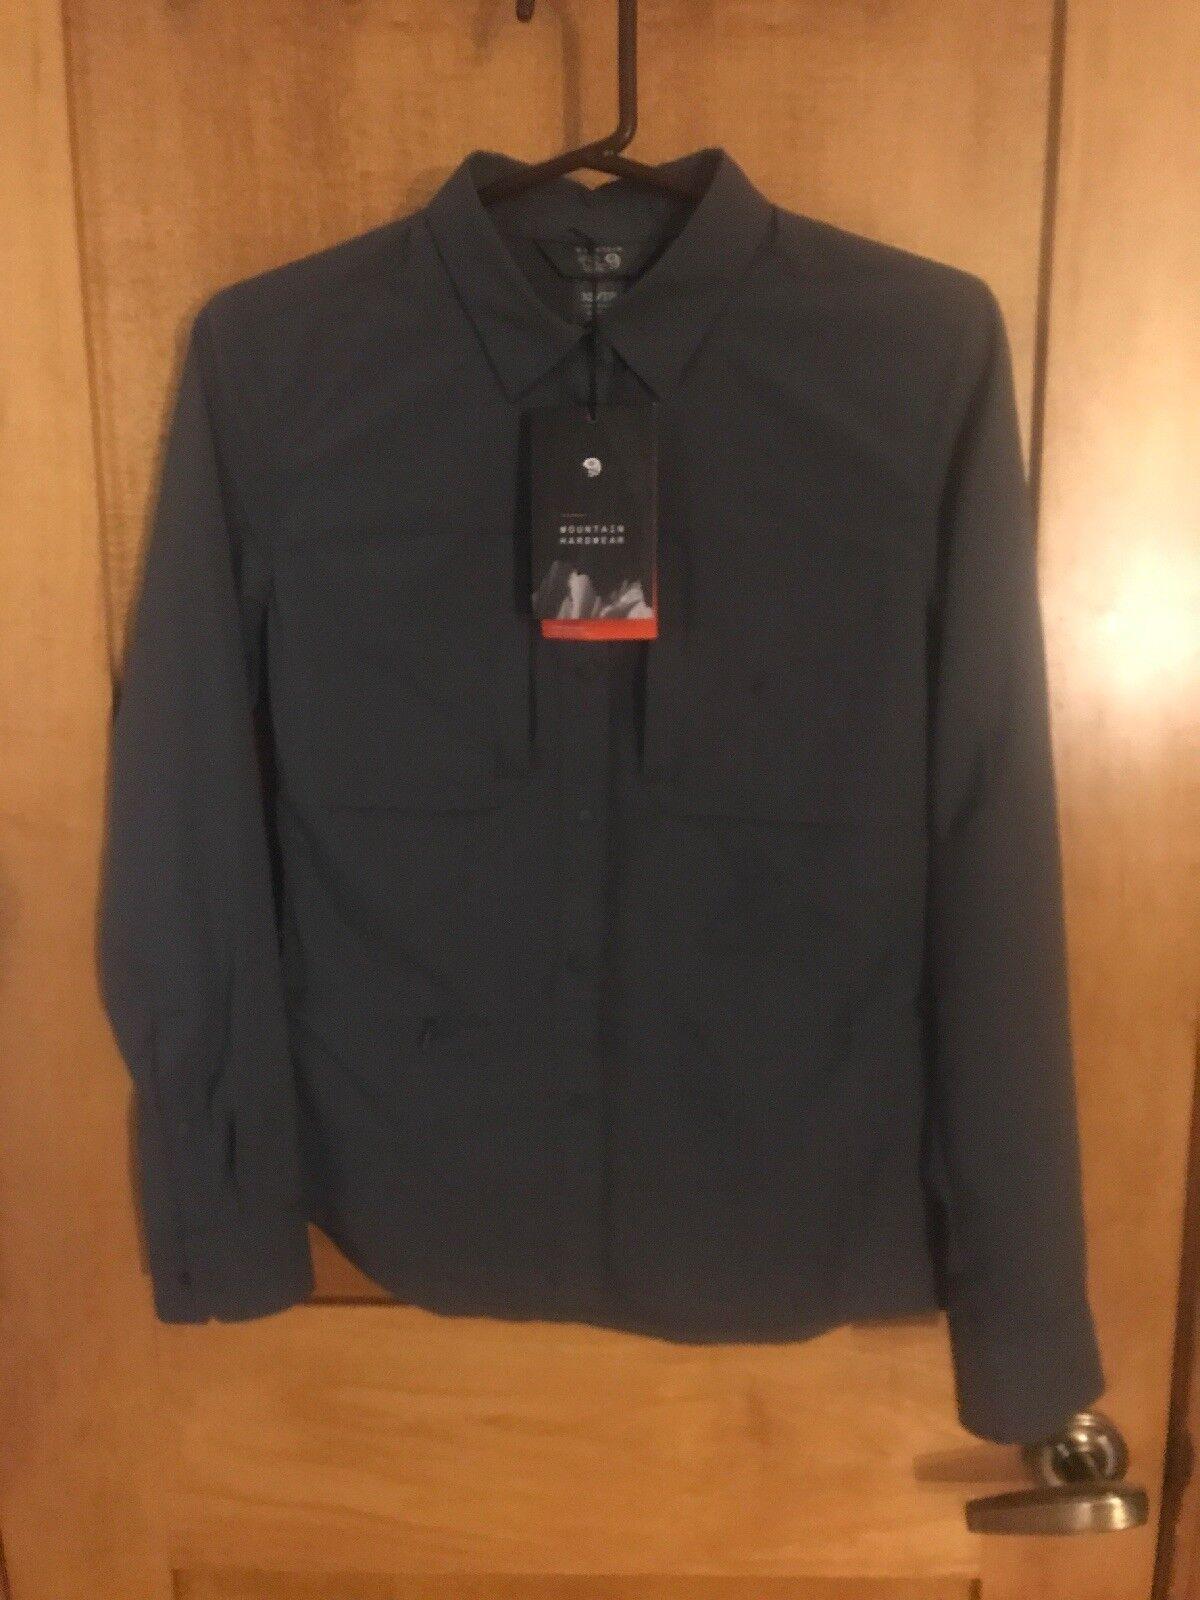 NWT Womens Mountain Hardwear Canyon Pro Long Sleeve Shirt - Black - XSmall